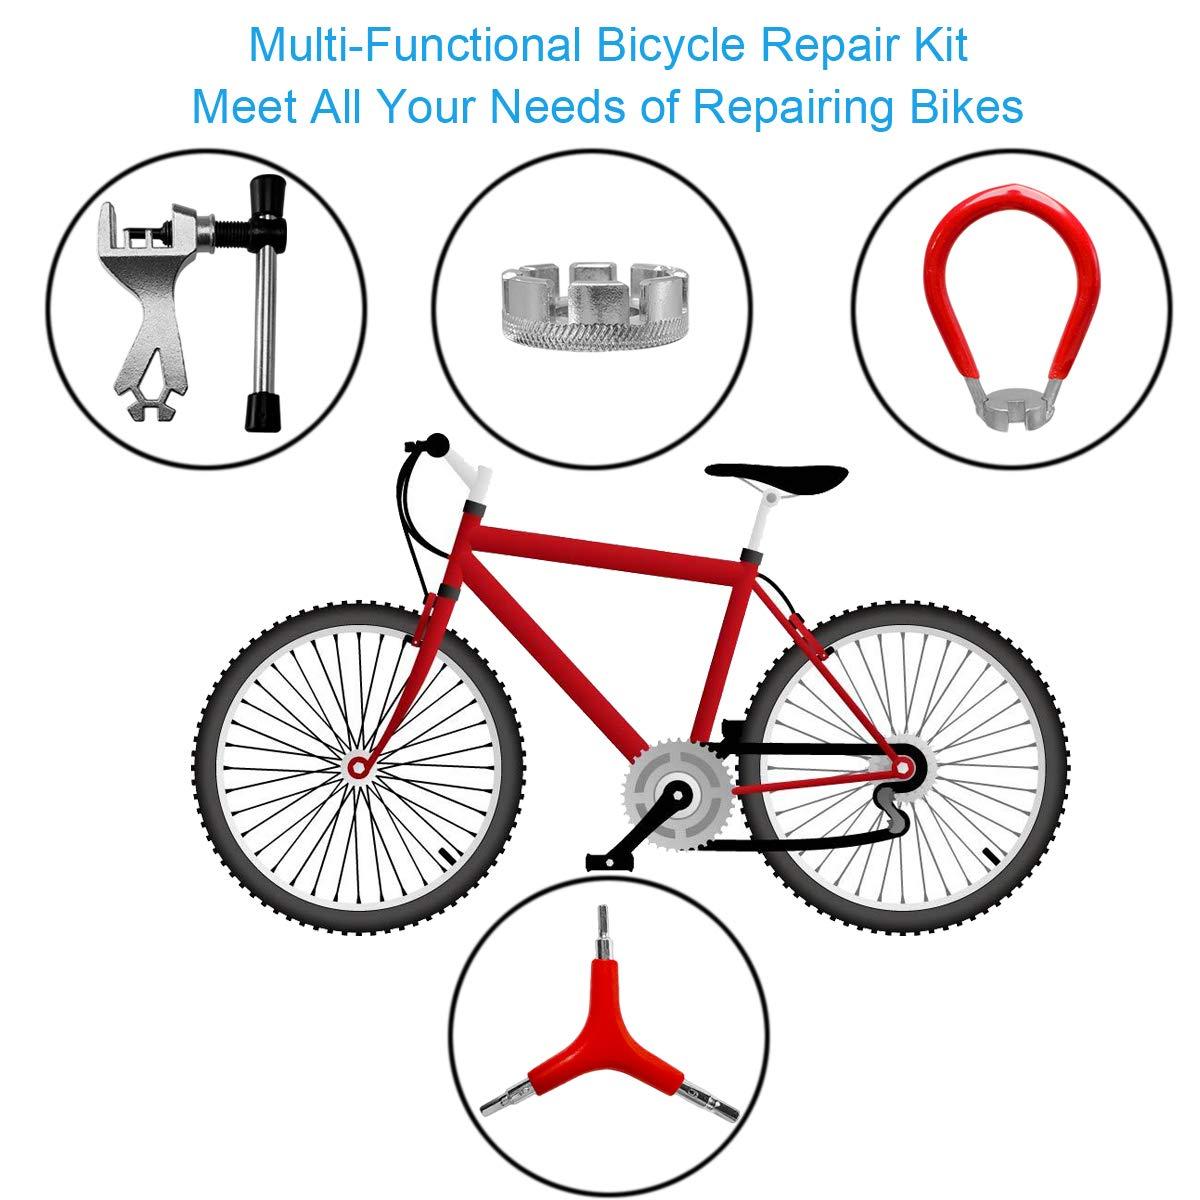 Tockrop 4 Pack Bike Repair Tool Kit Include Bike Spoke Wrench Three-in-One Screwdriver and Chain Repair Tool